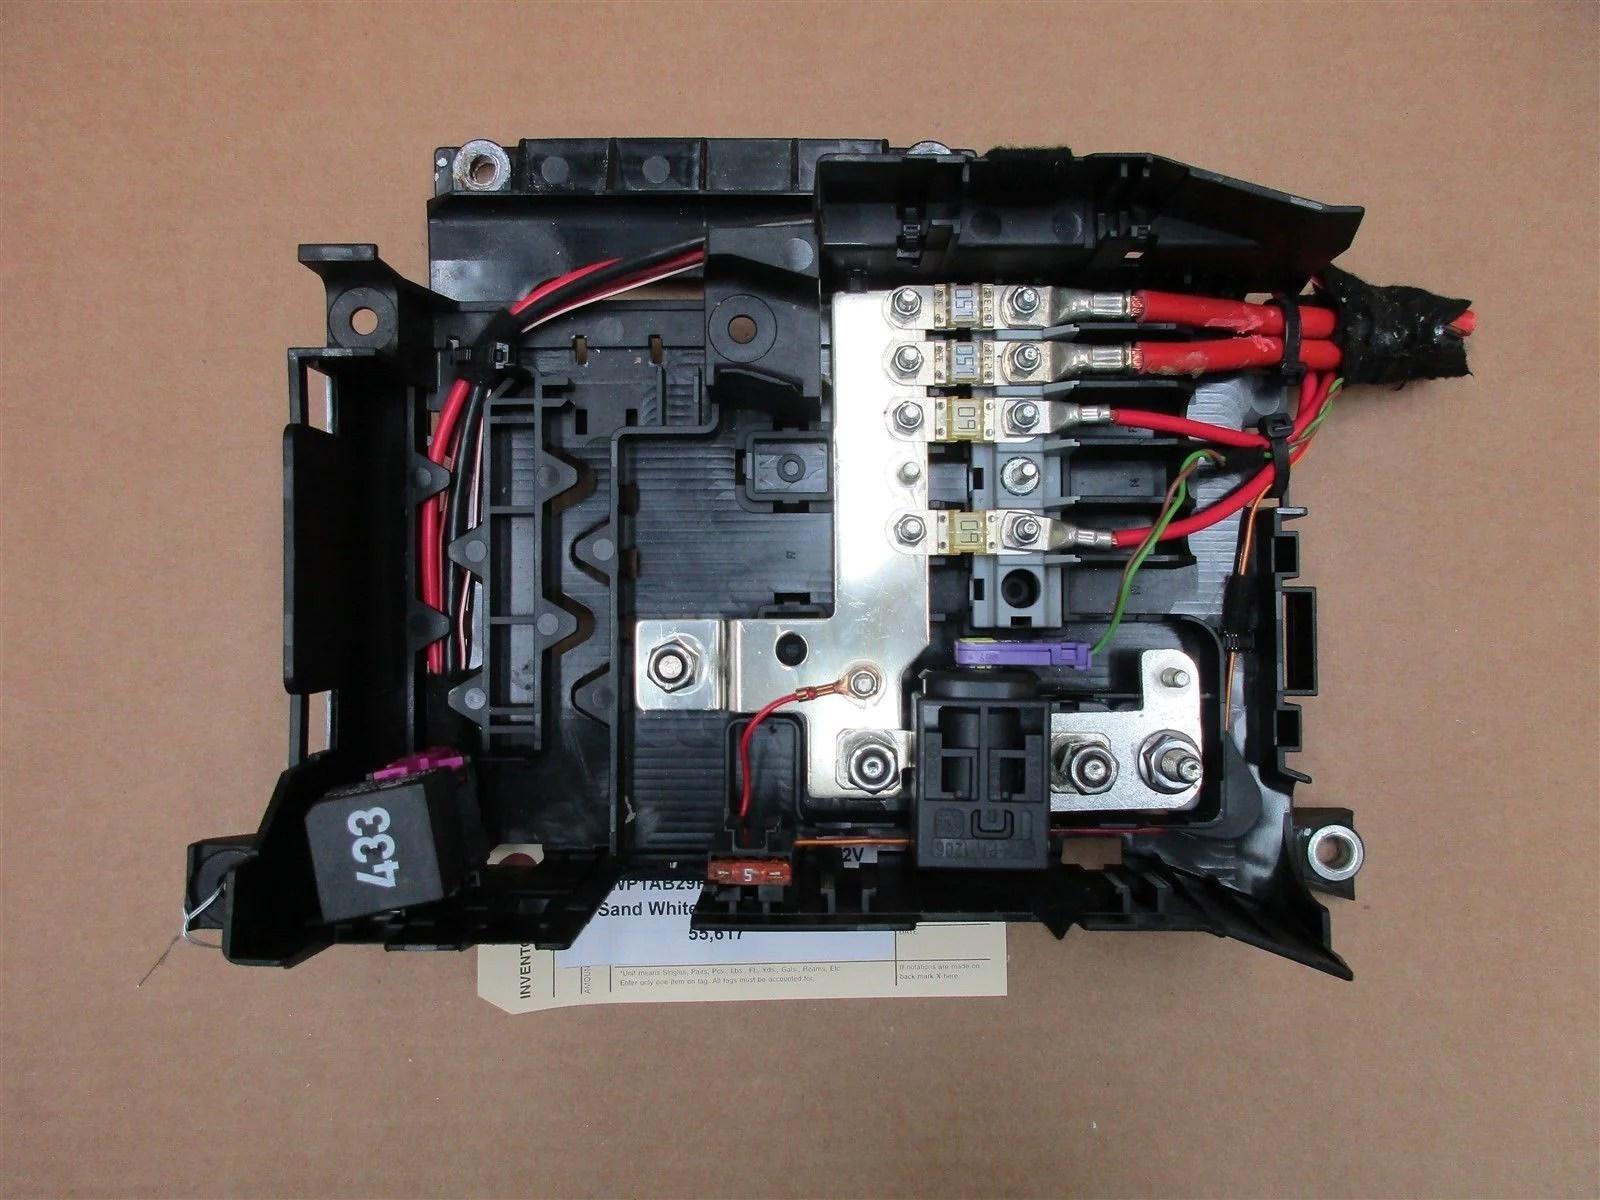 08 cayenne s awd porsche 957 fuse box relay 7l0937548c 3d0951253a 55 617 [ 1600 x 1200 Pixel ]